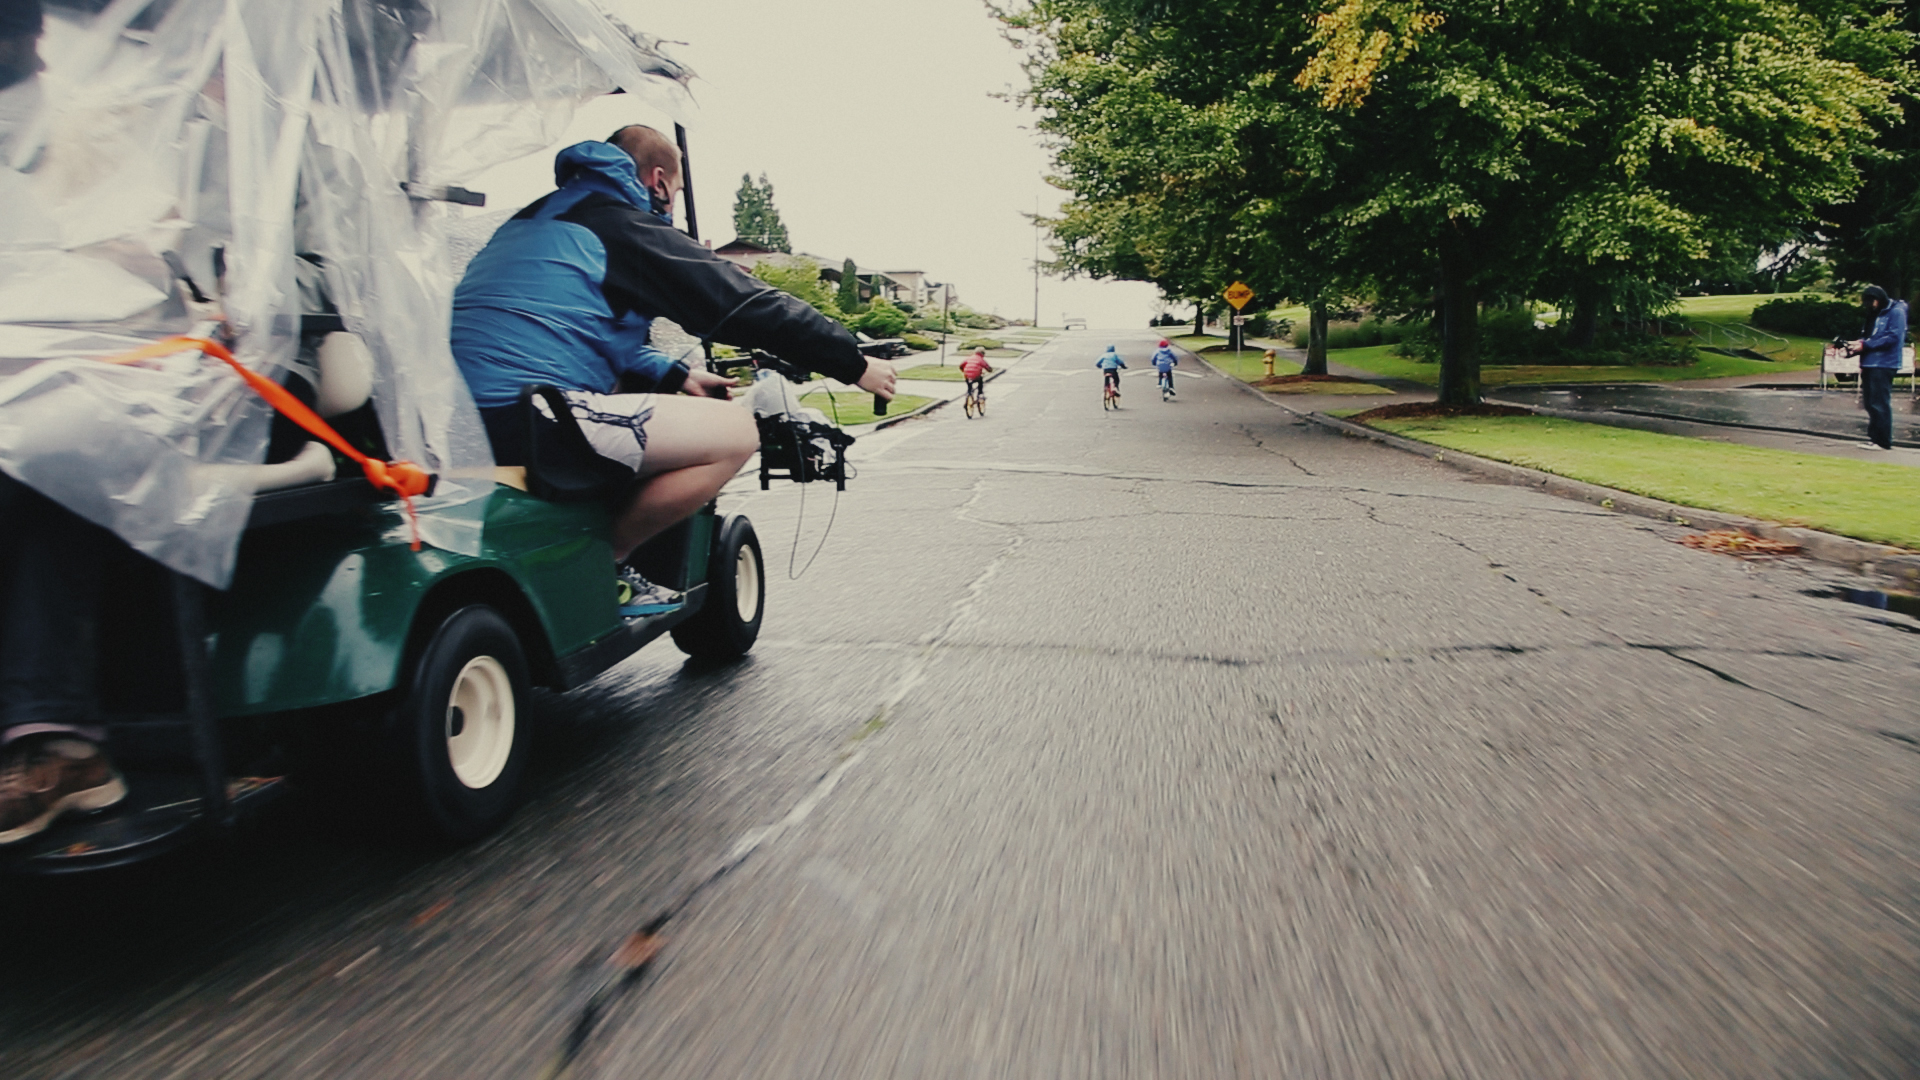 MINDCASTLE-from-1994-biking-BTS-02.jpg